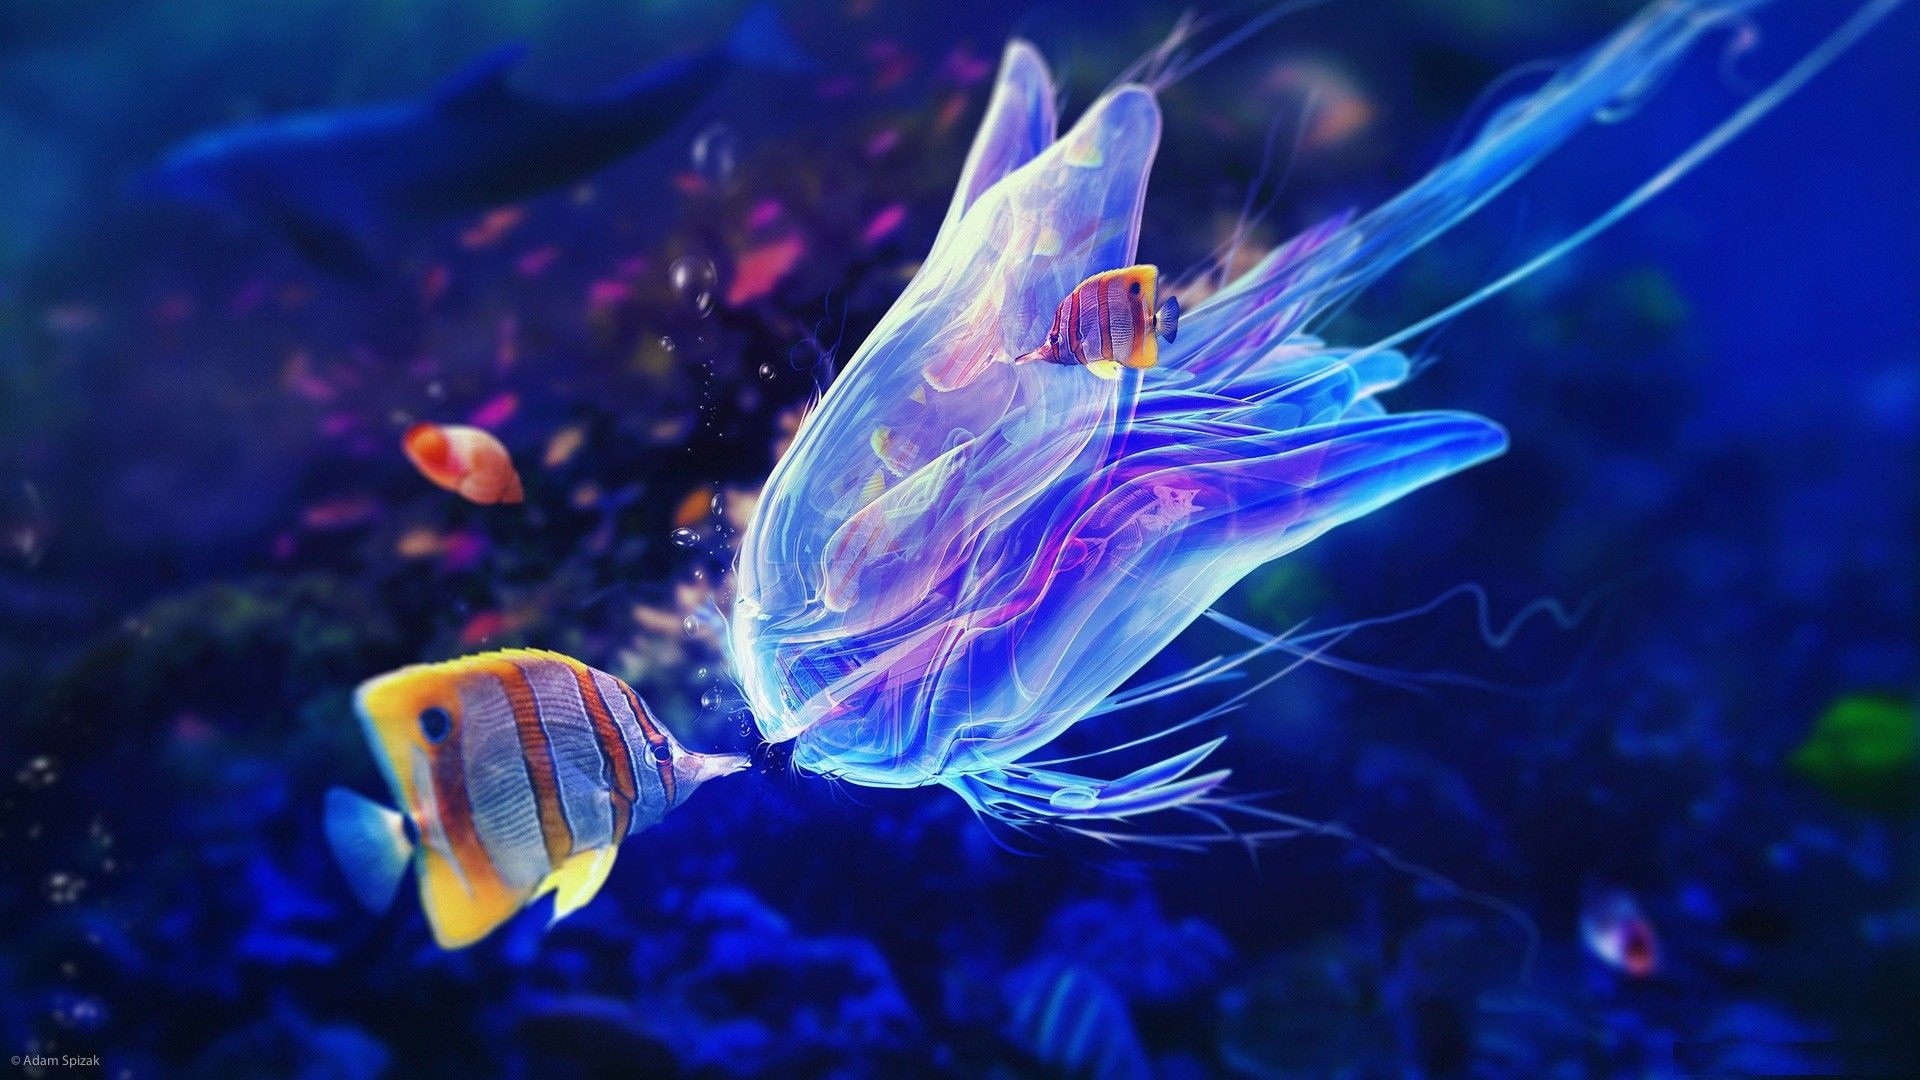 Underwater 1080p Wallpaper | Cool craft stuff | Pinterest ...